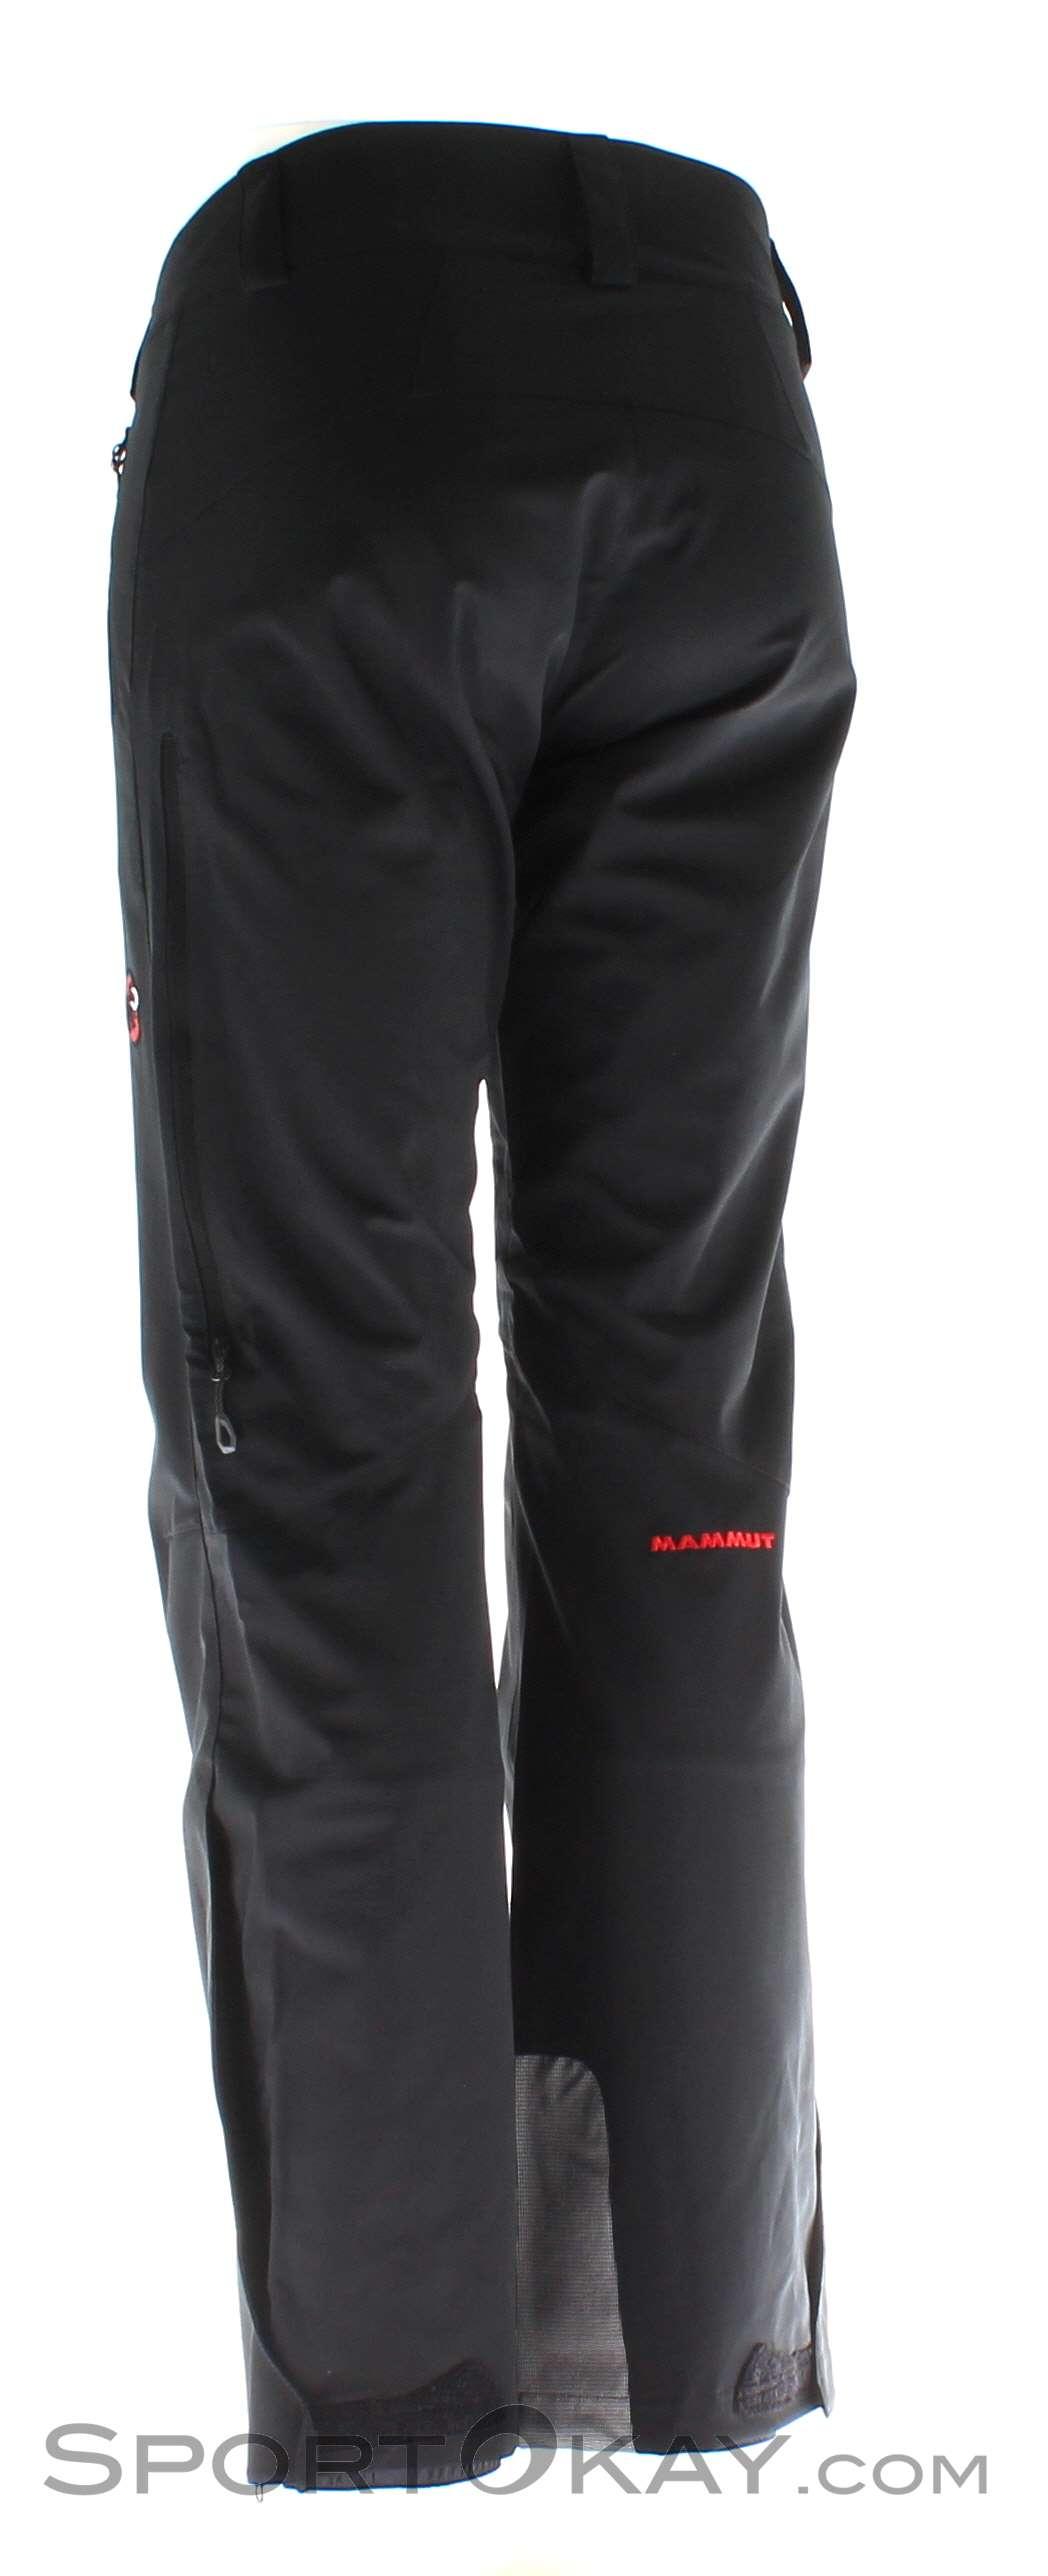 e620c703bfc1a Mammut Trea Pants Womens Ski Touring Pants , Mammut, Black, , Female, 0014